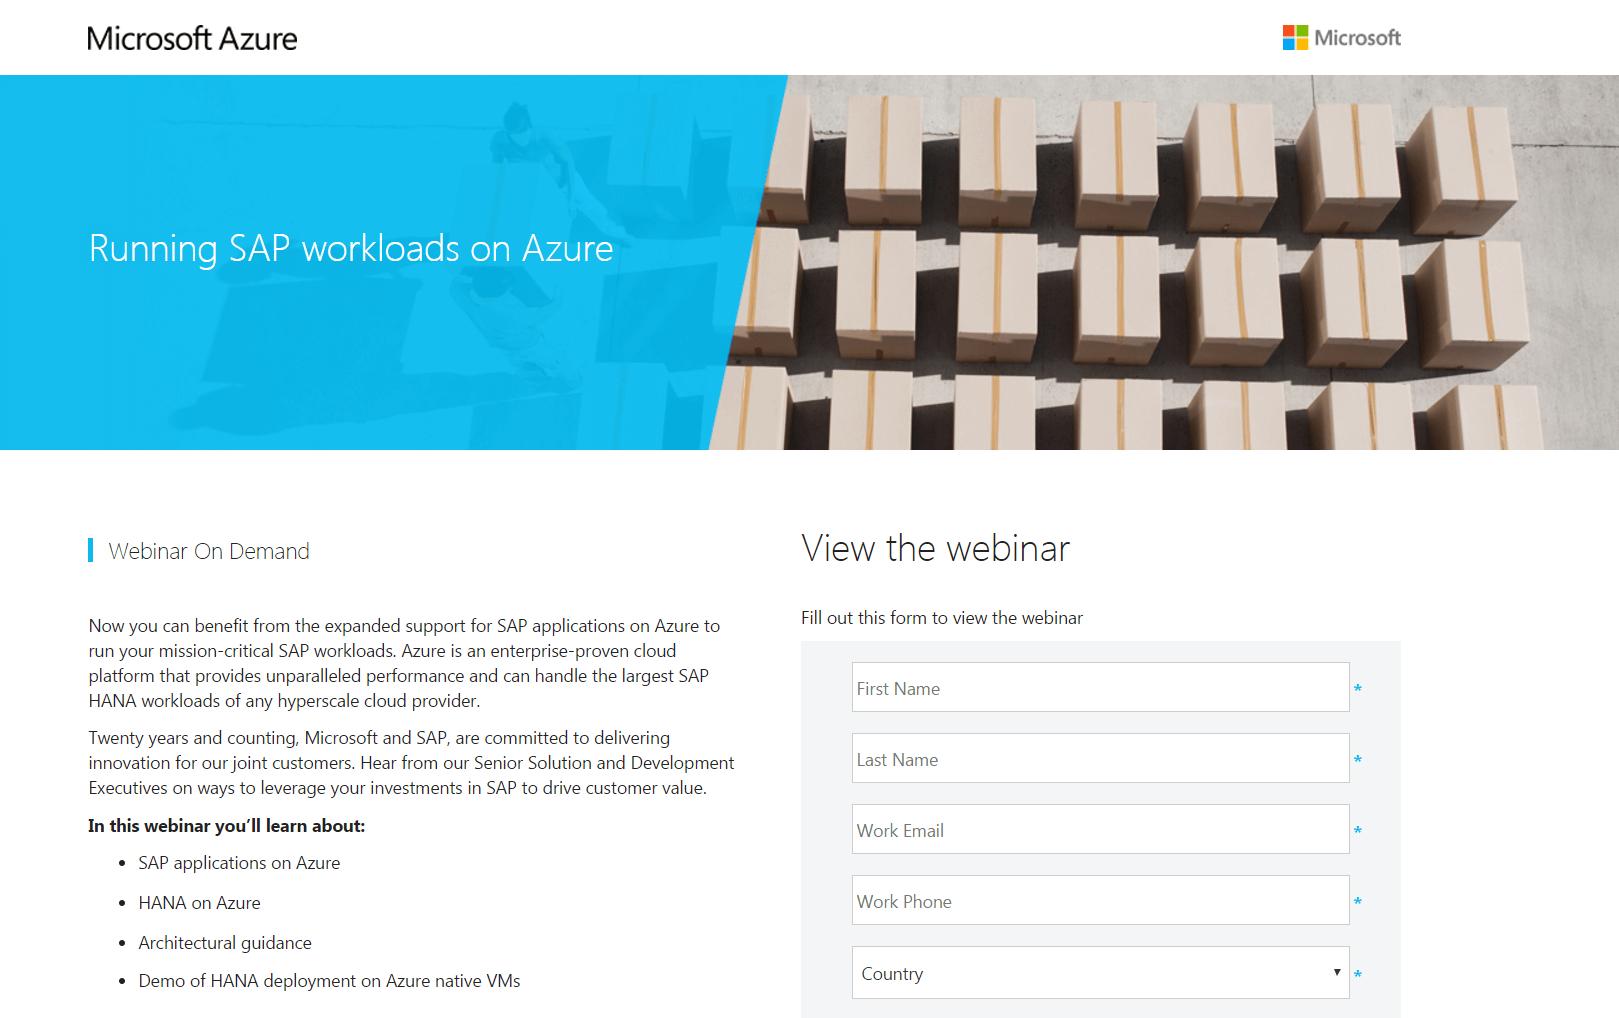 A Microsoft webinar.